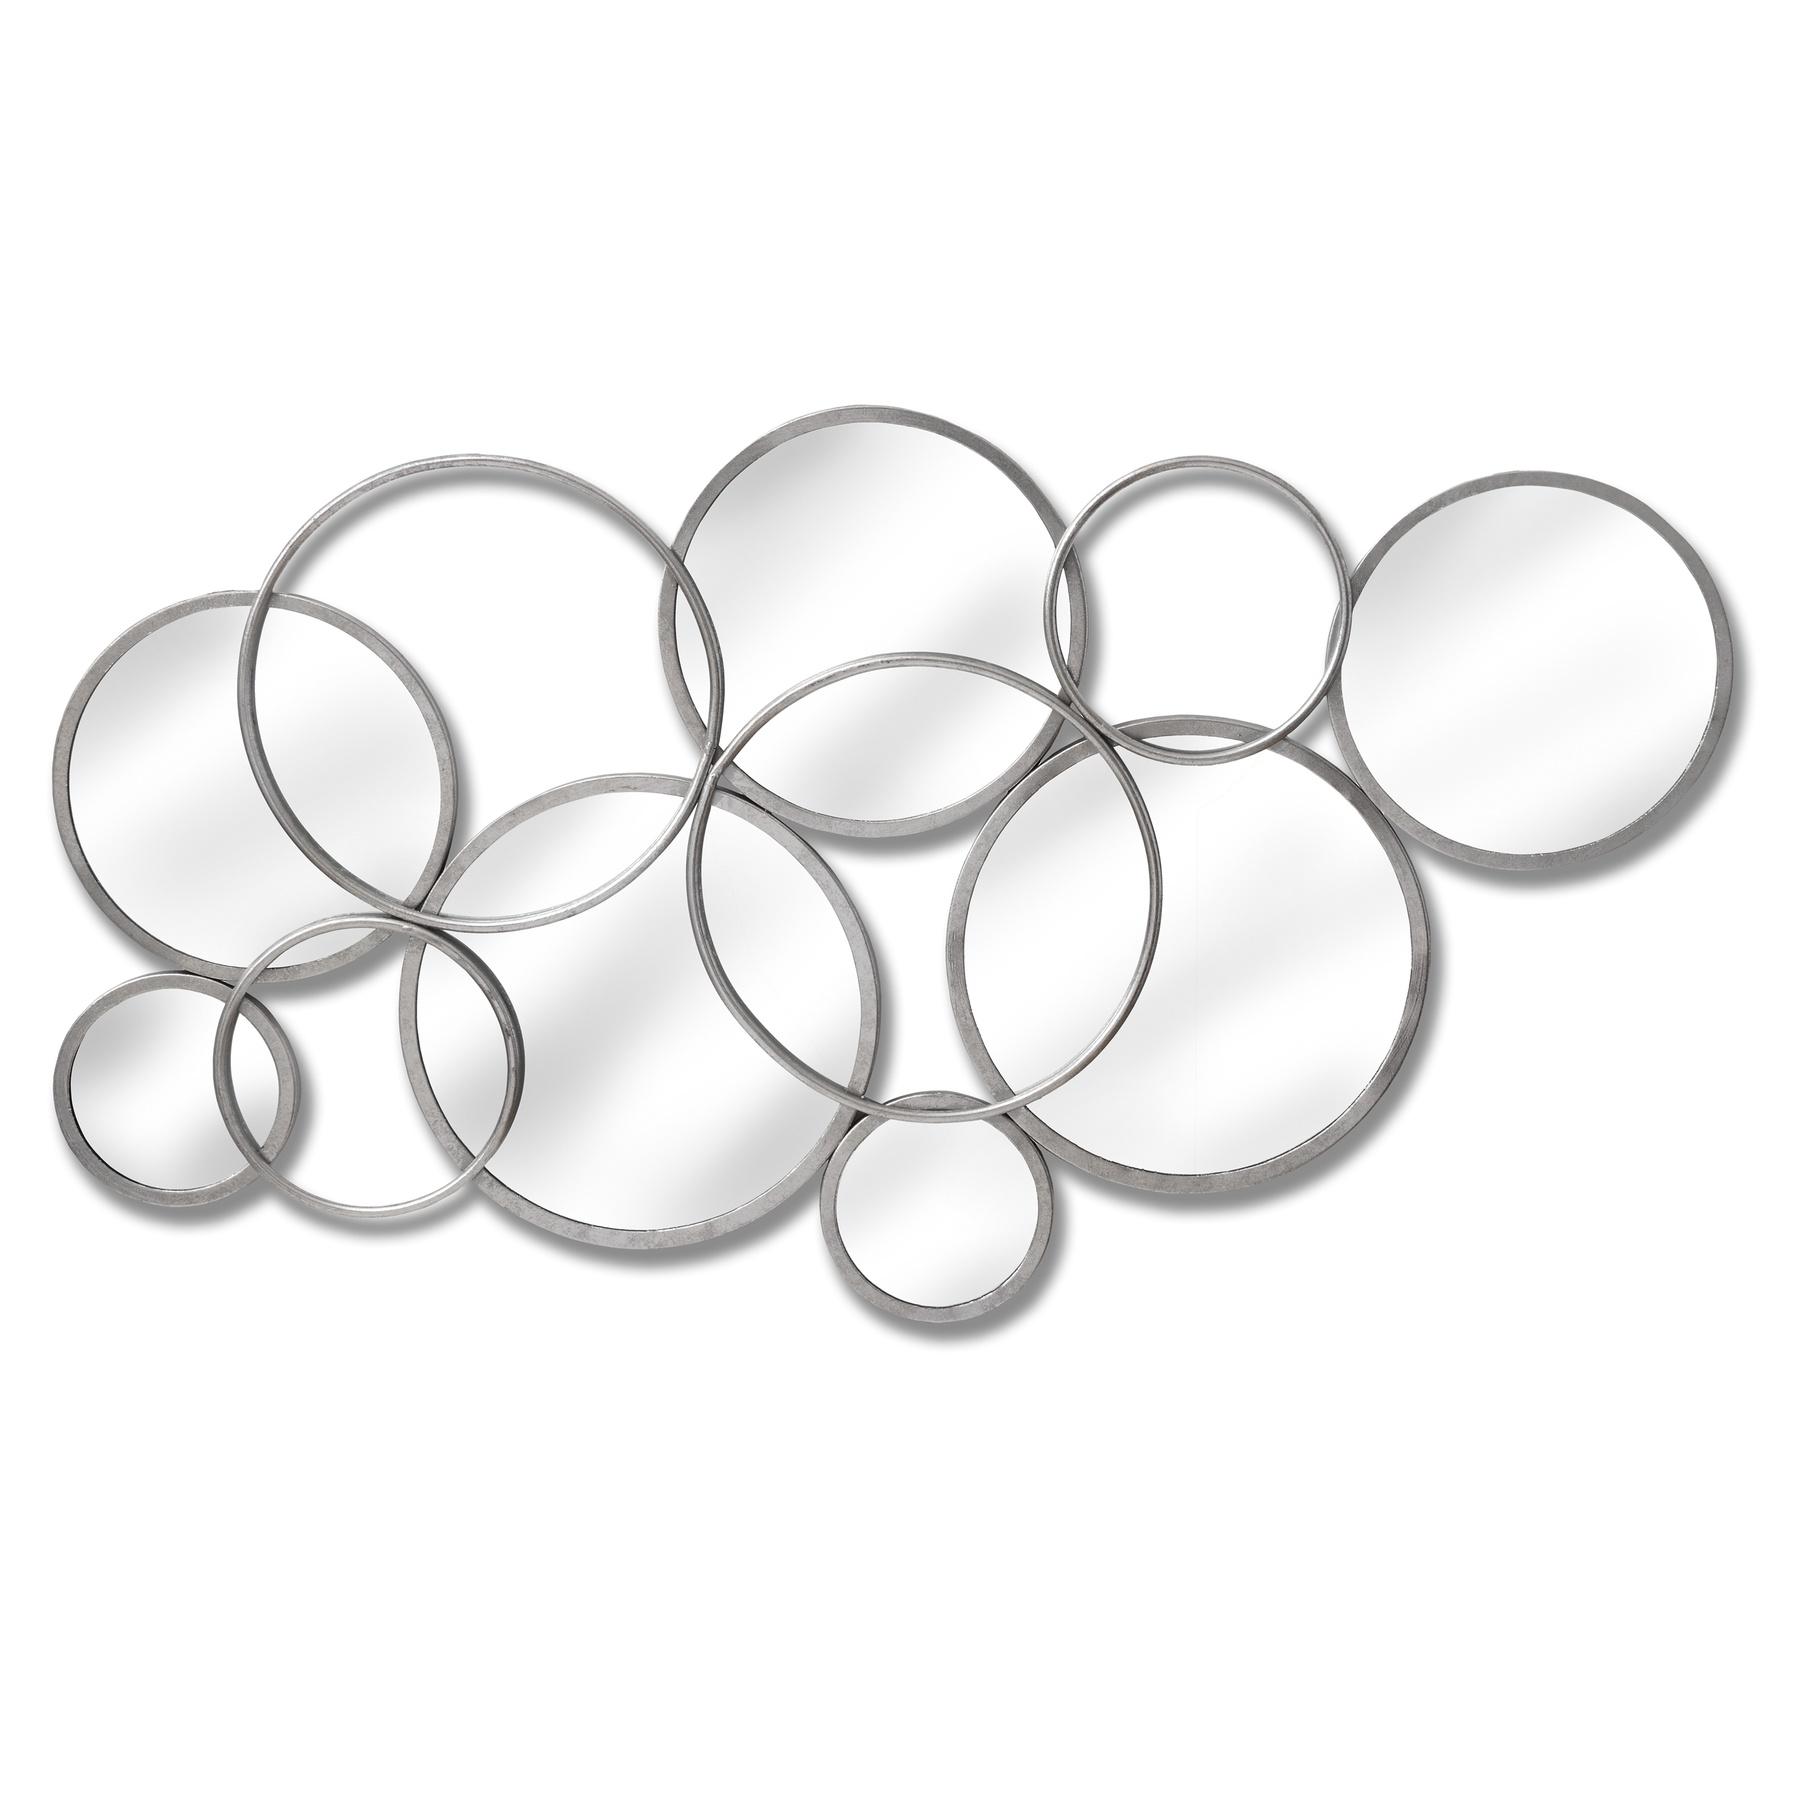 Large Silver Circular Abstract Mirrored Wall Art